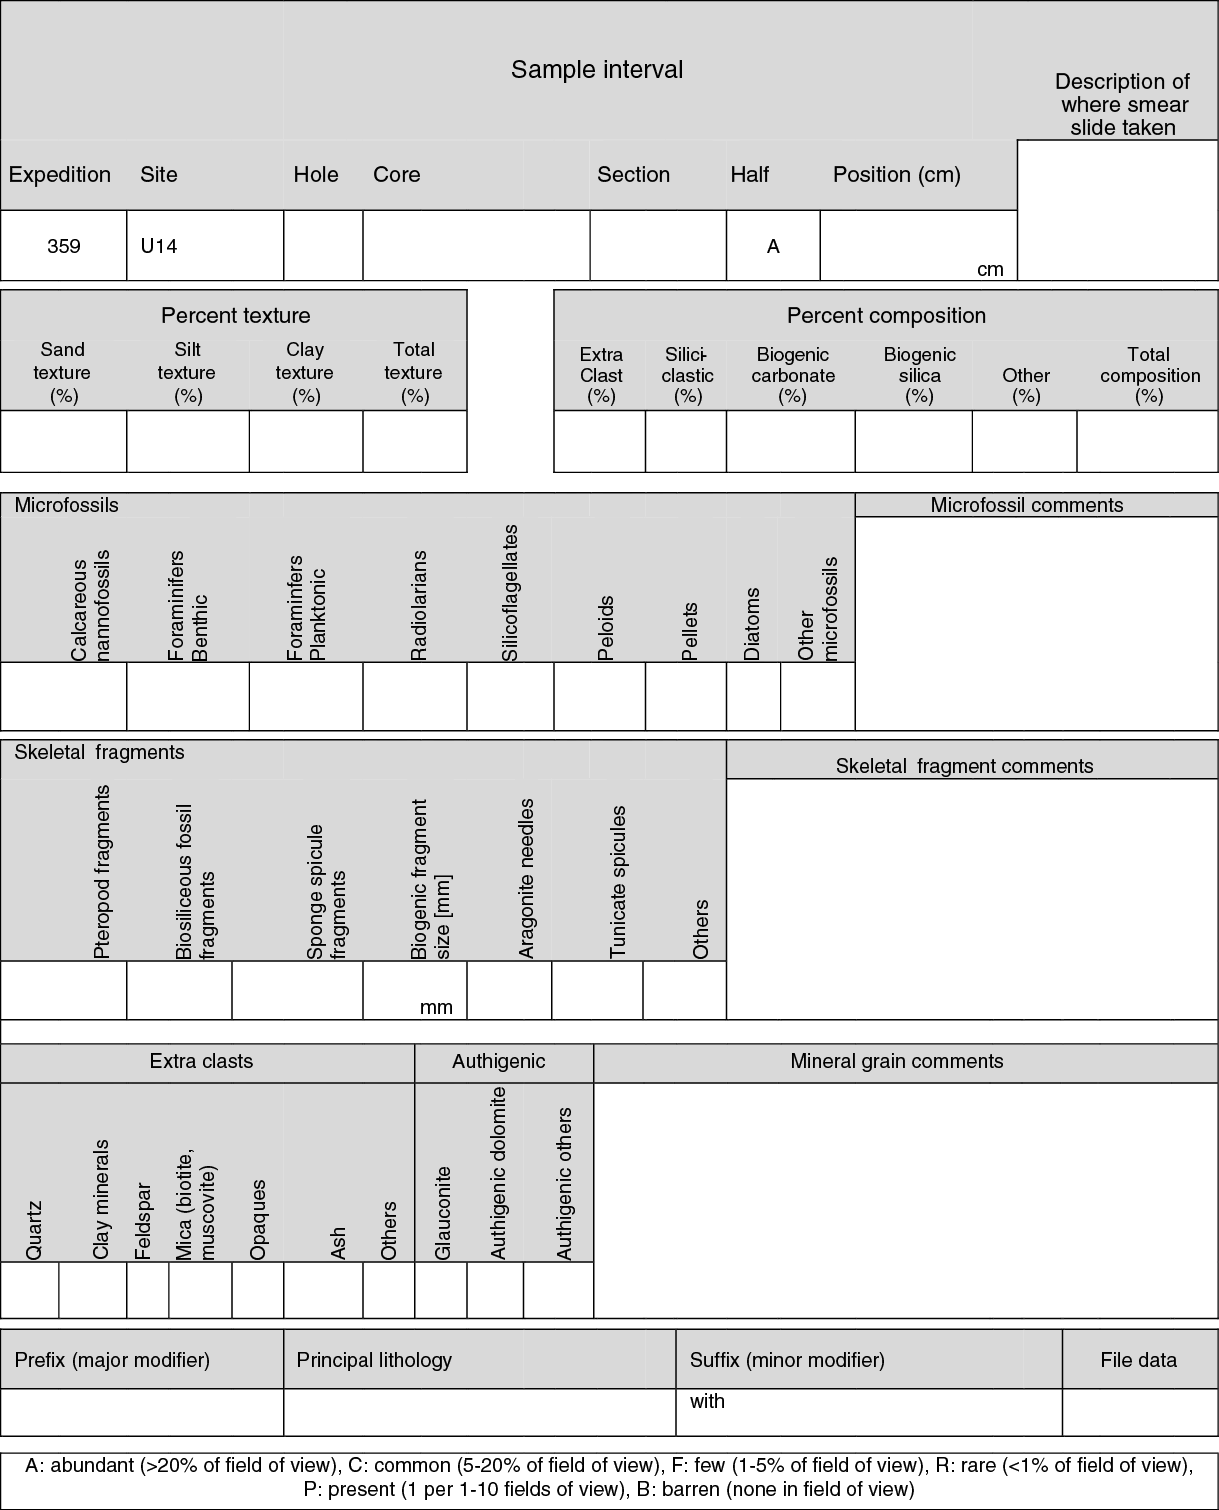 Early Algebra Worksheets Iodp Publications  Volume  Expedition Reports  Expedition   Multiplication Worksheets Free Printables Excel with Simple Interest Math Worksheets Excel Figure F Smear Slide Analysis Data Worksheet Long U Worksheets 1st Grade